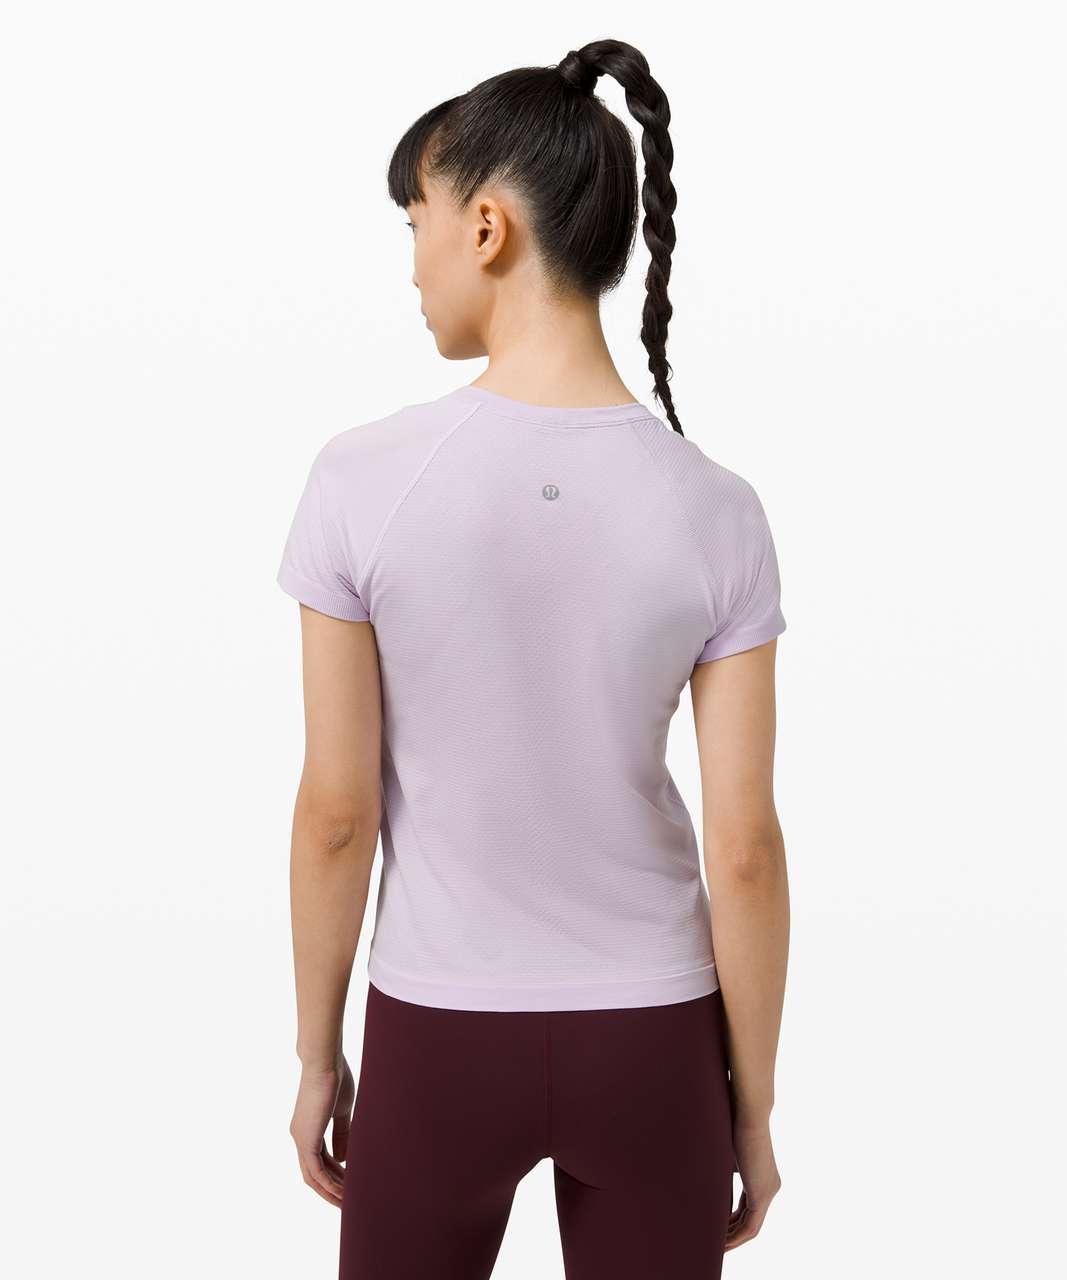 Lululemon Swiftly Tech Short Sleeve 2.0 *Race Length - Lavender Dew / Lavender Dew